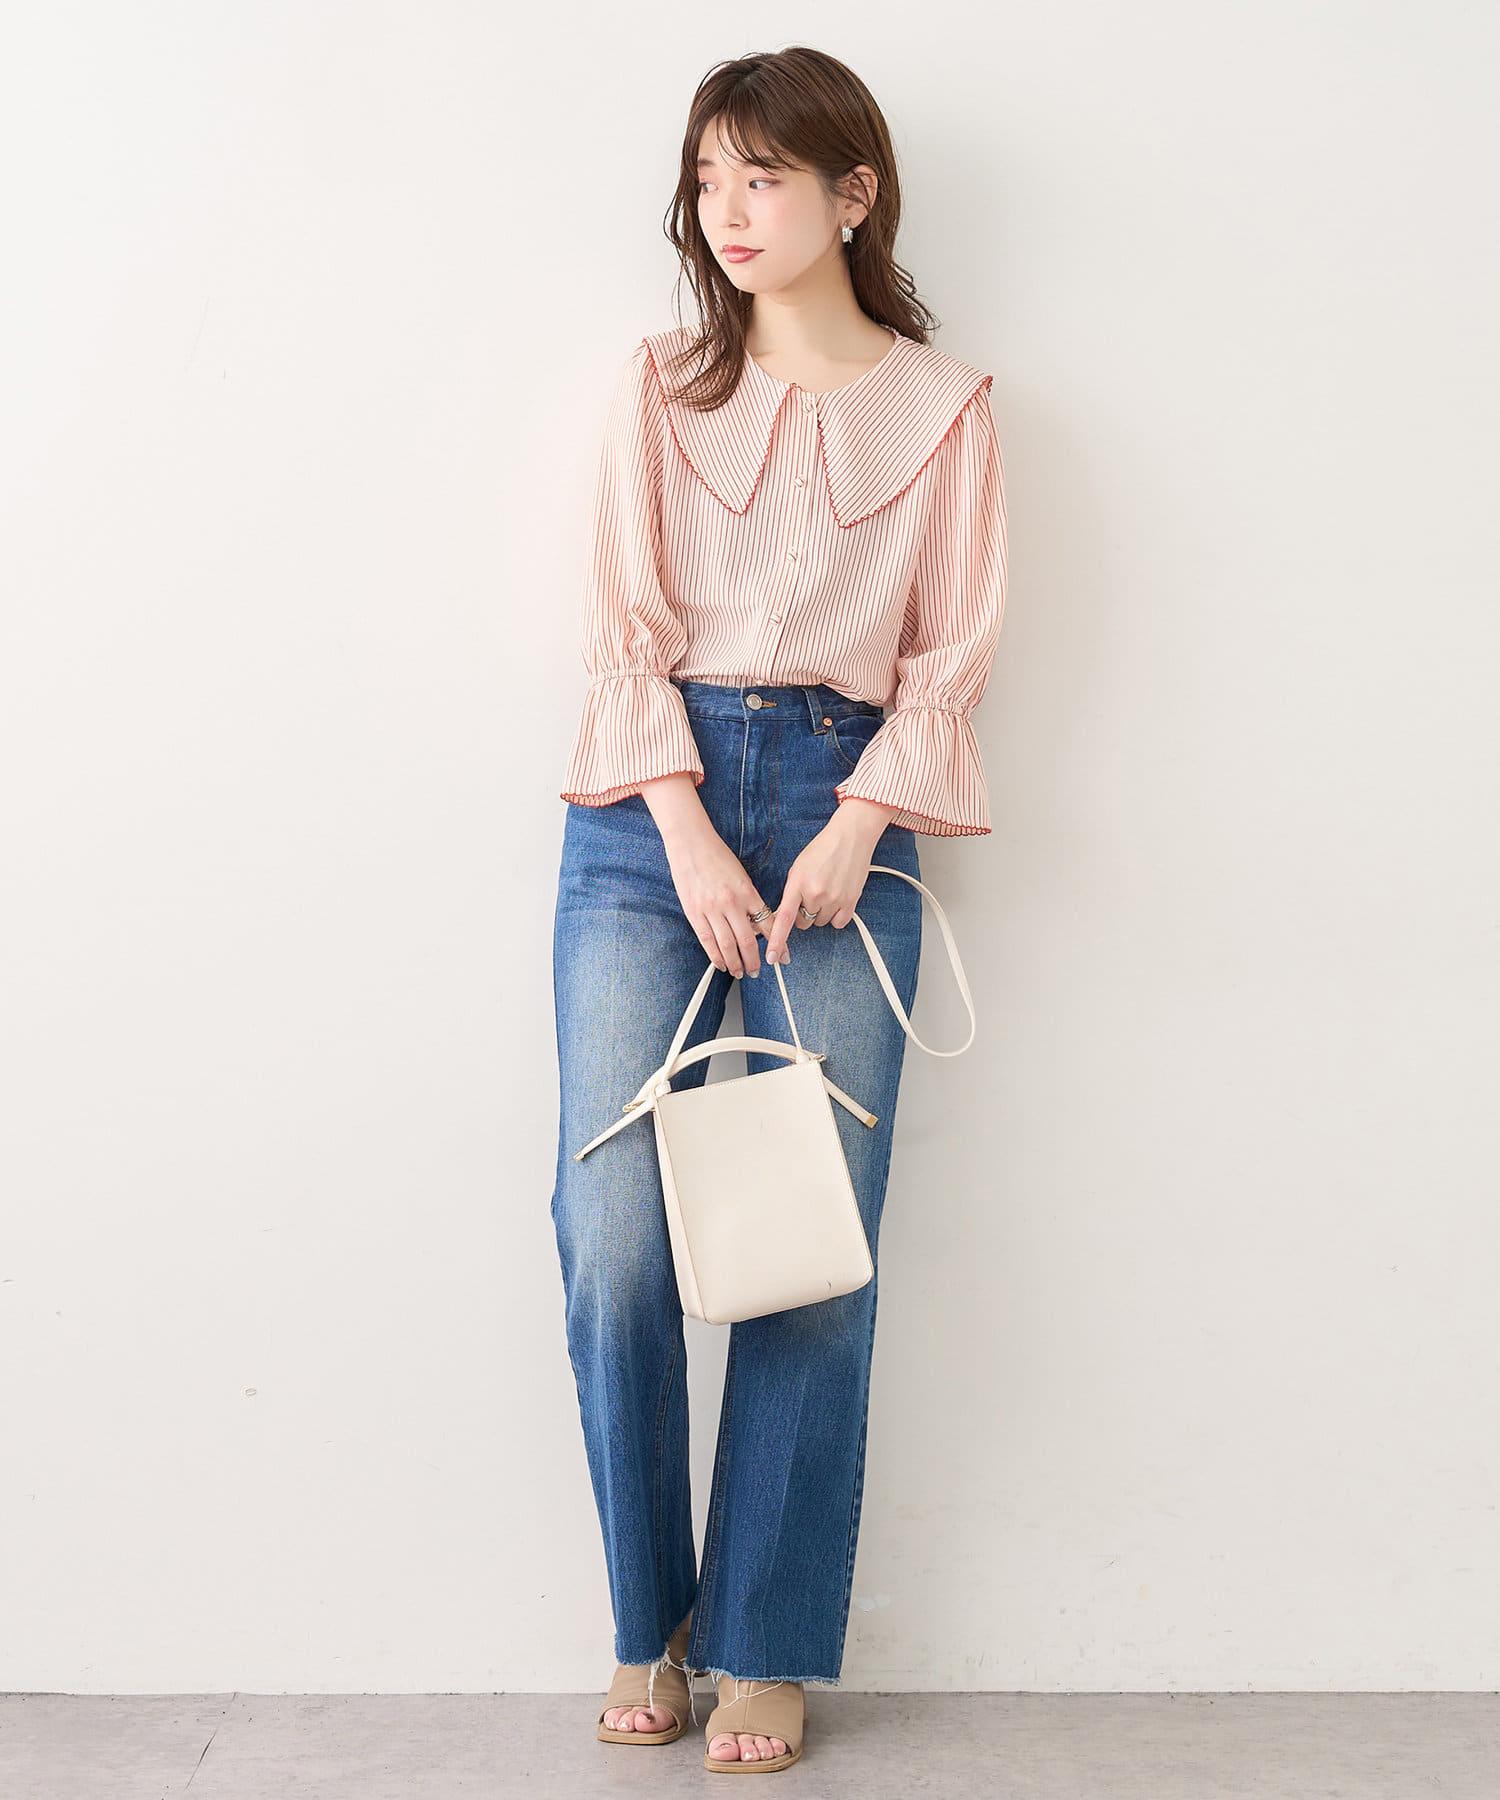 natural couture(ナチュラルクチュール) 【WEB限定】配色ピコ刺繍セーラーカラーブラウス